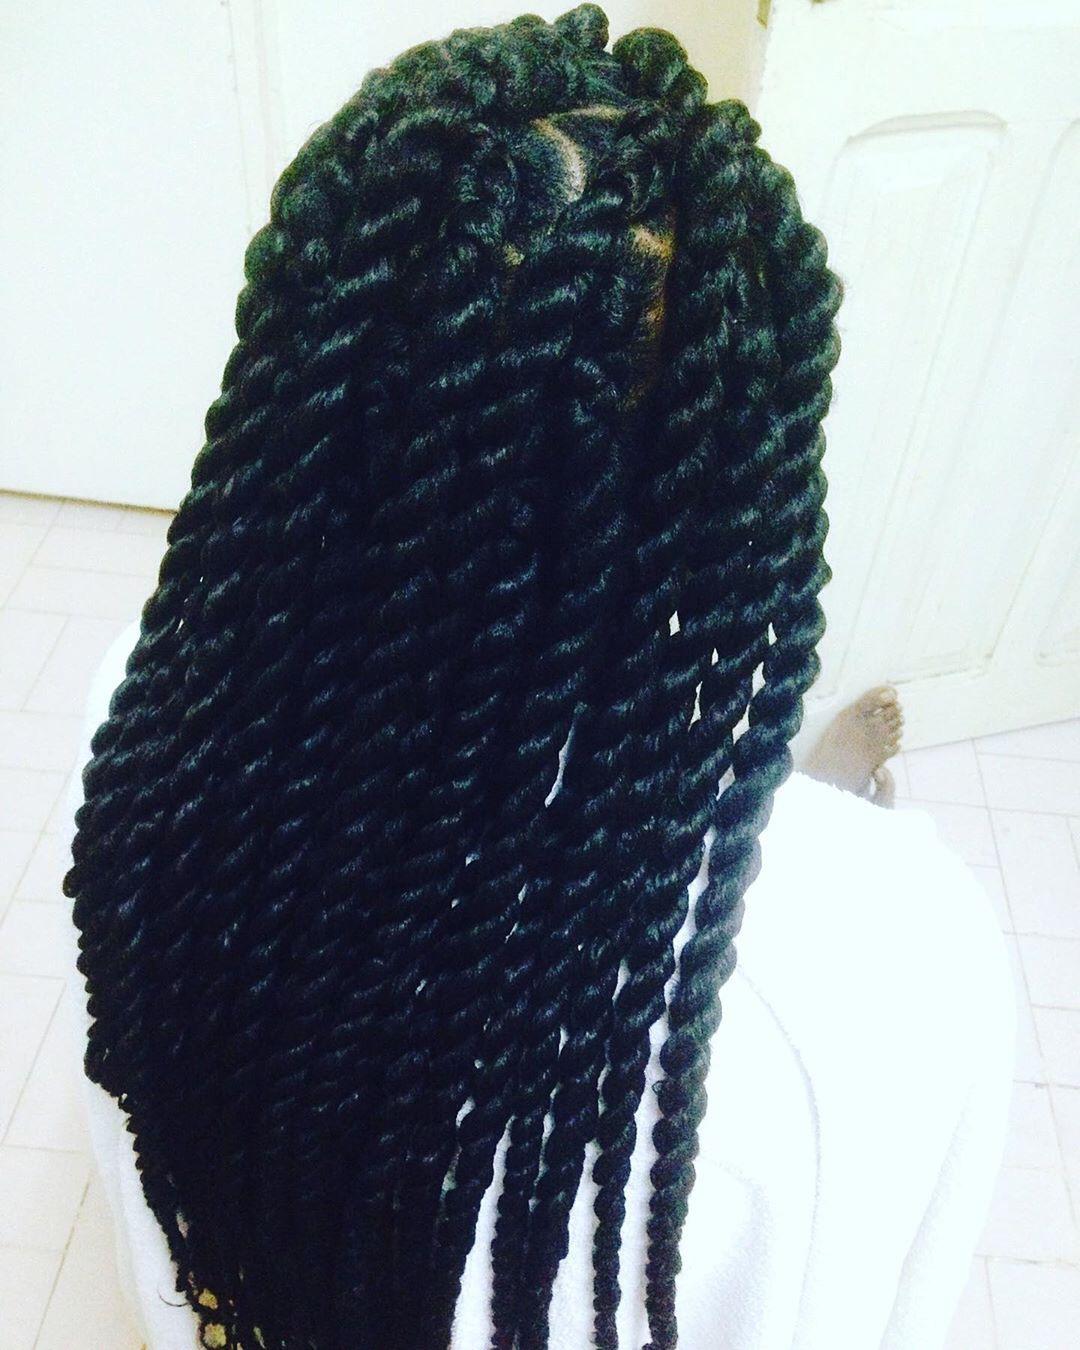 salon de coiffure afro tresse tresses box braids crochet braids vanilles tissages paris 75 77 78 91 92 93 94 95 IAJPAZSI